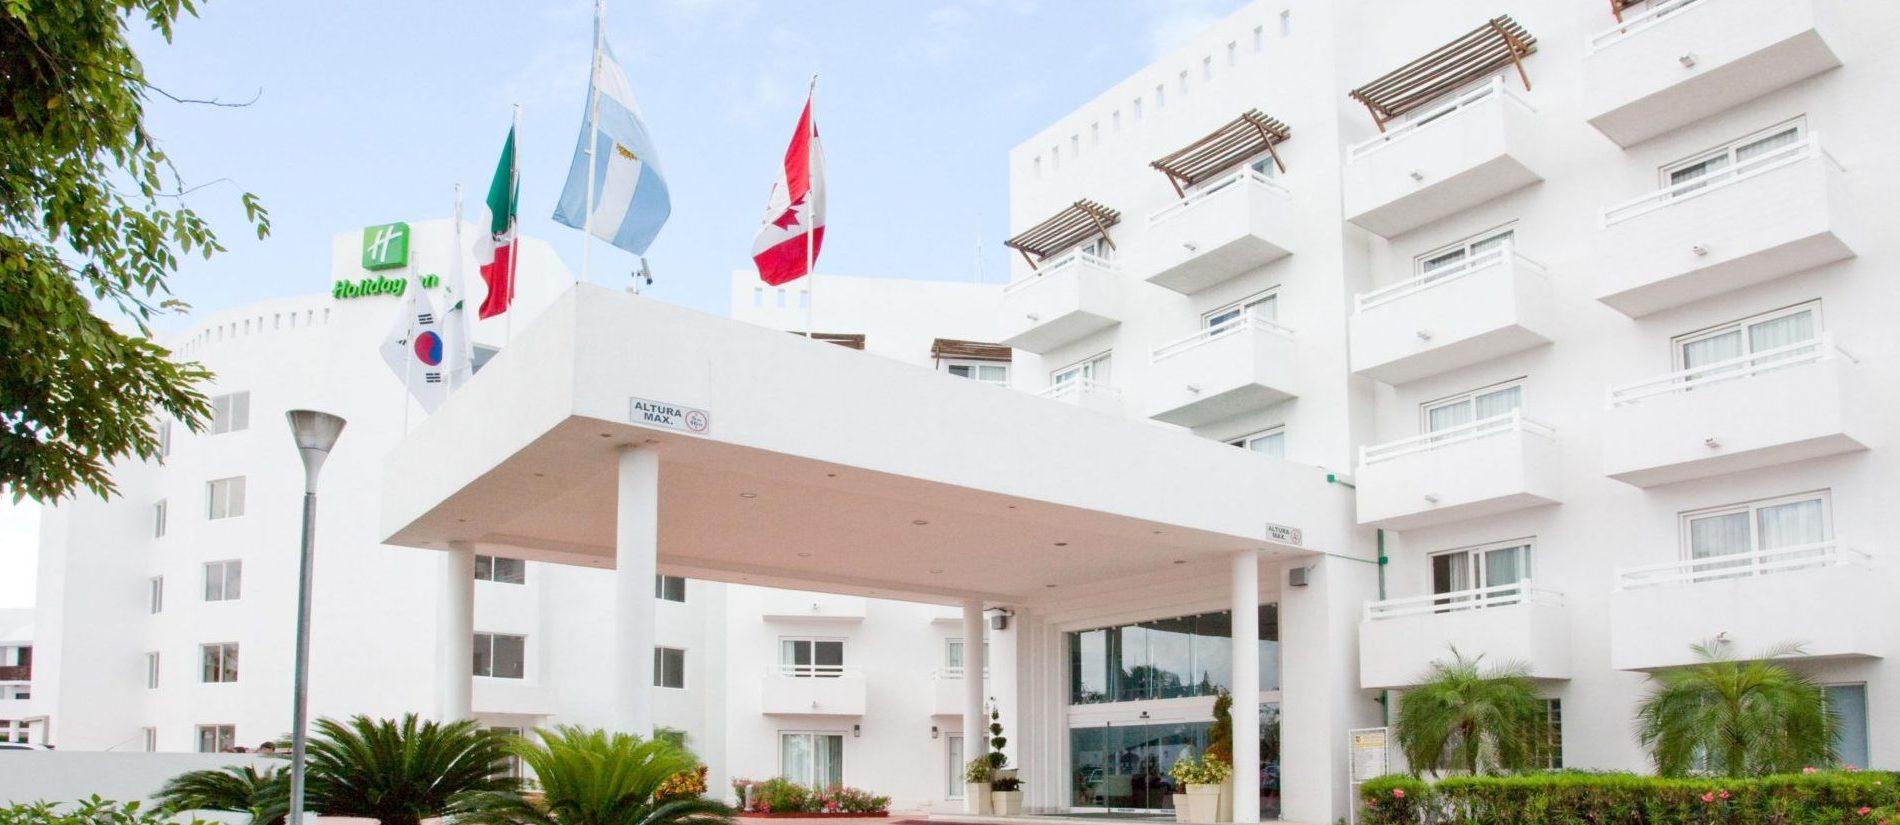 holiday-inn-cancun-arenas-2